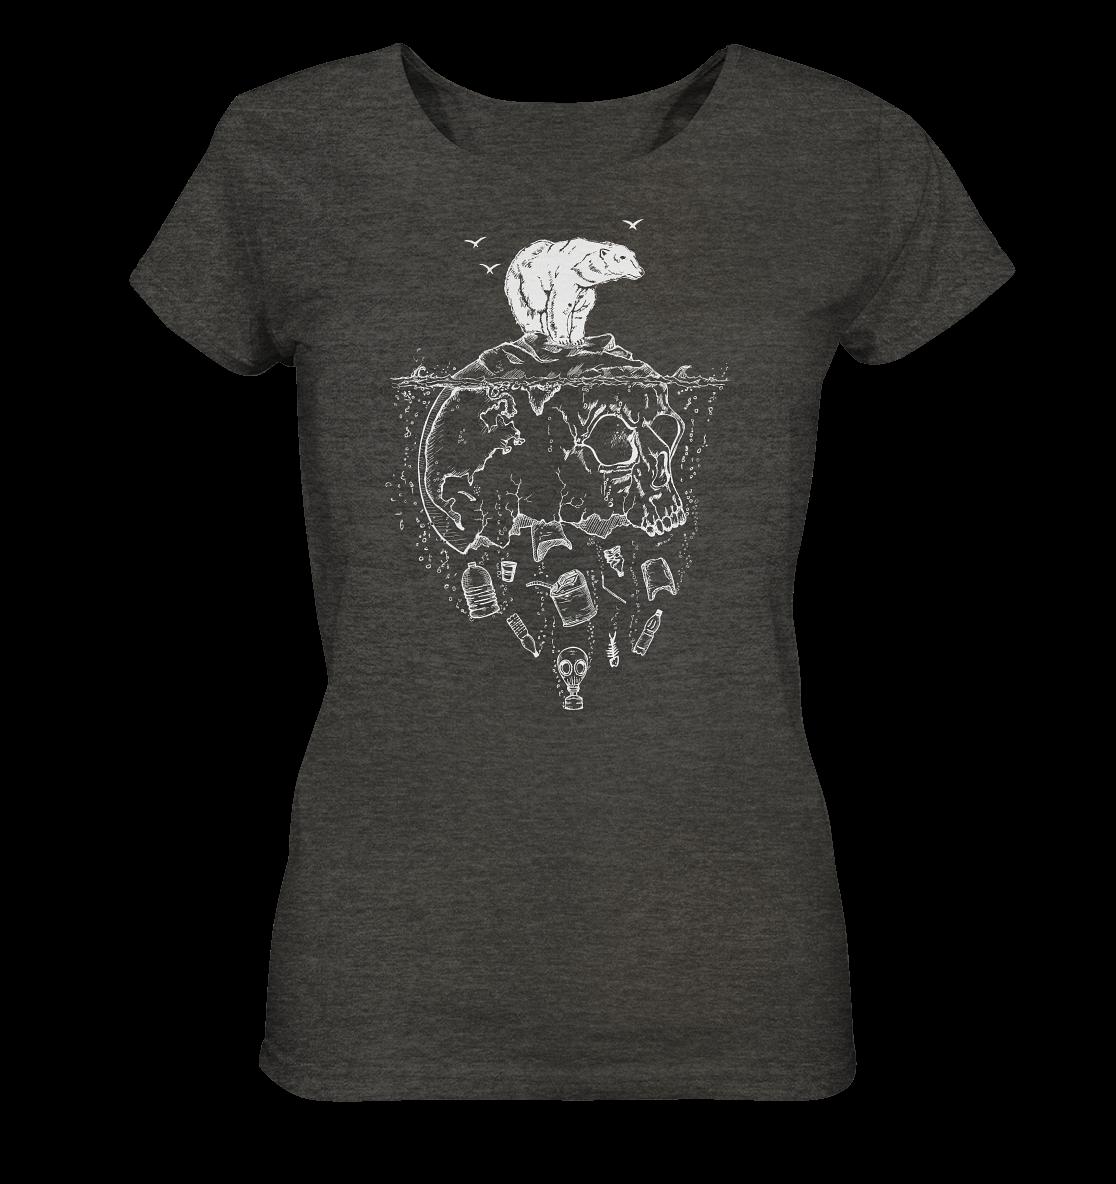 front-ladies-organic-shirt-meliert-252625-1116x-5.png